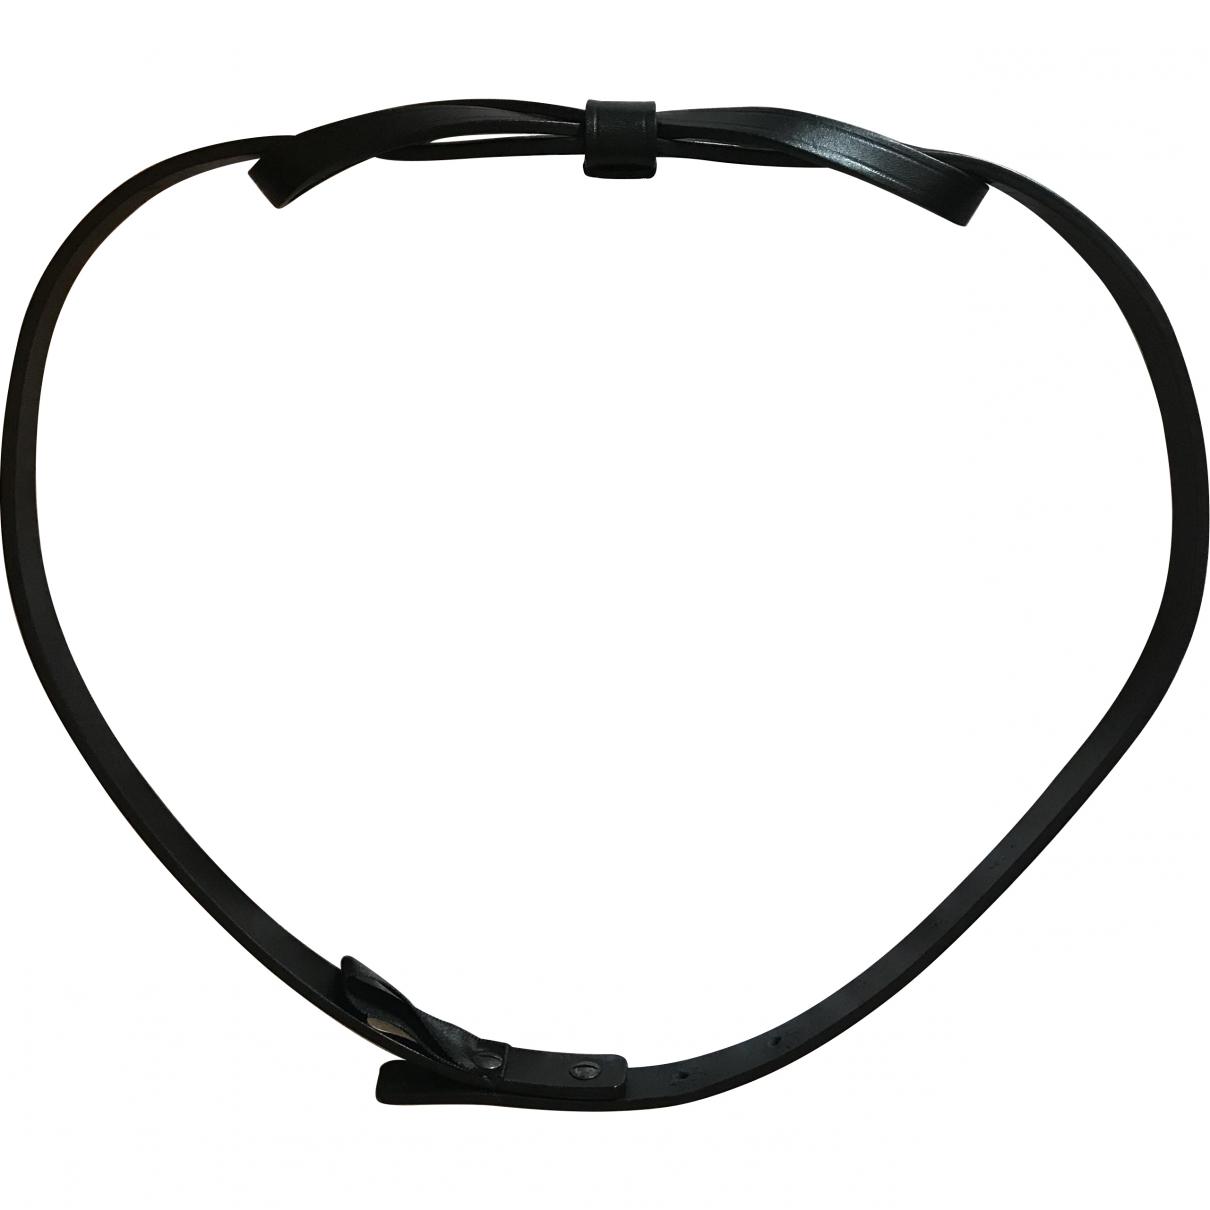 Lanvin \N Black Leather belt for Women M International